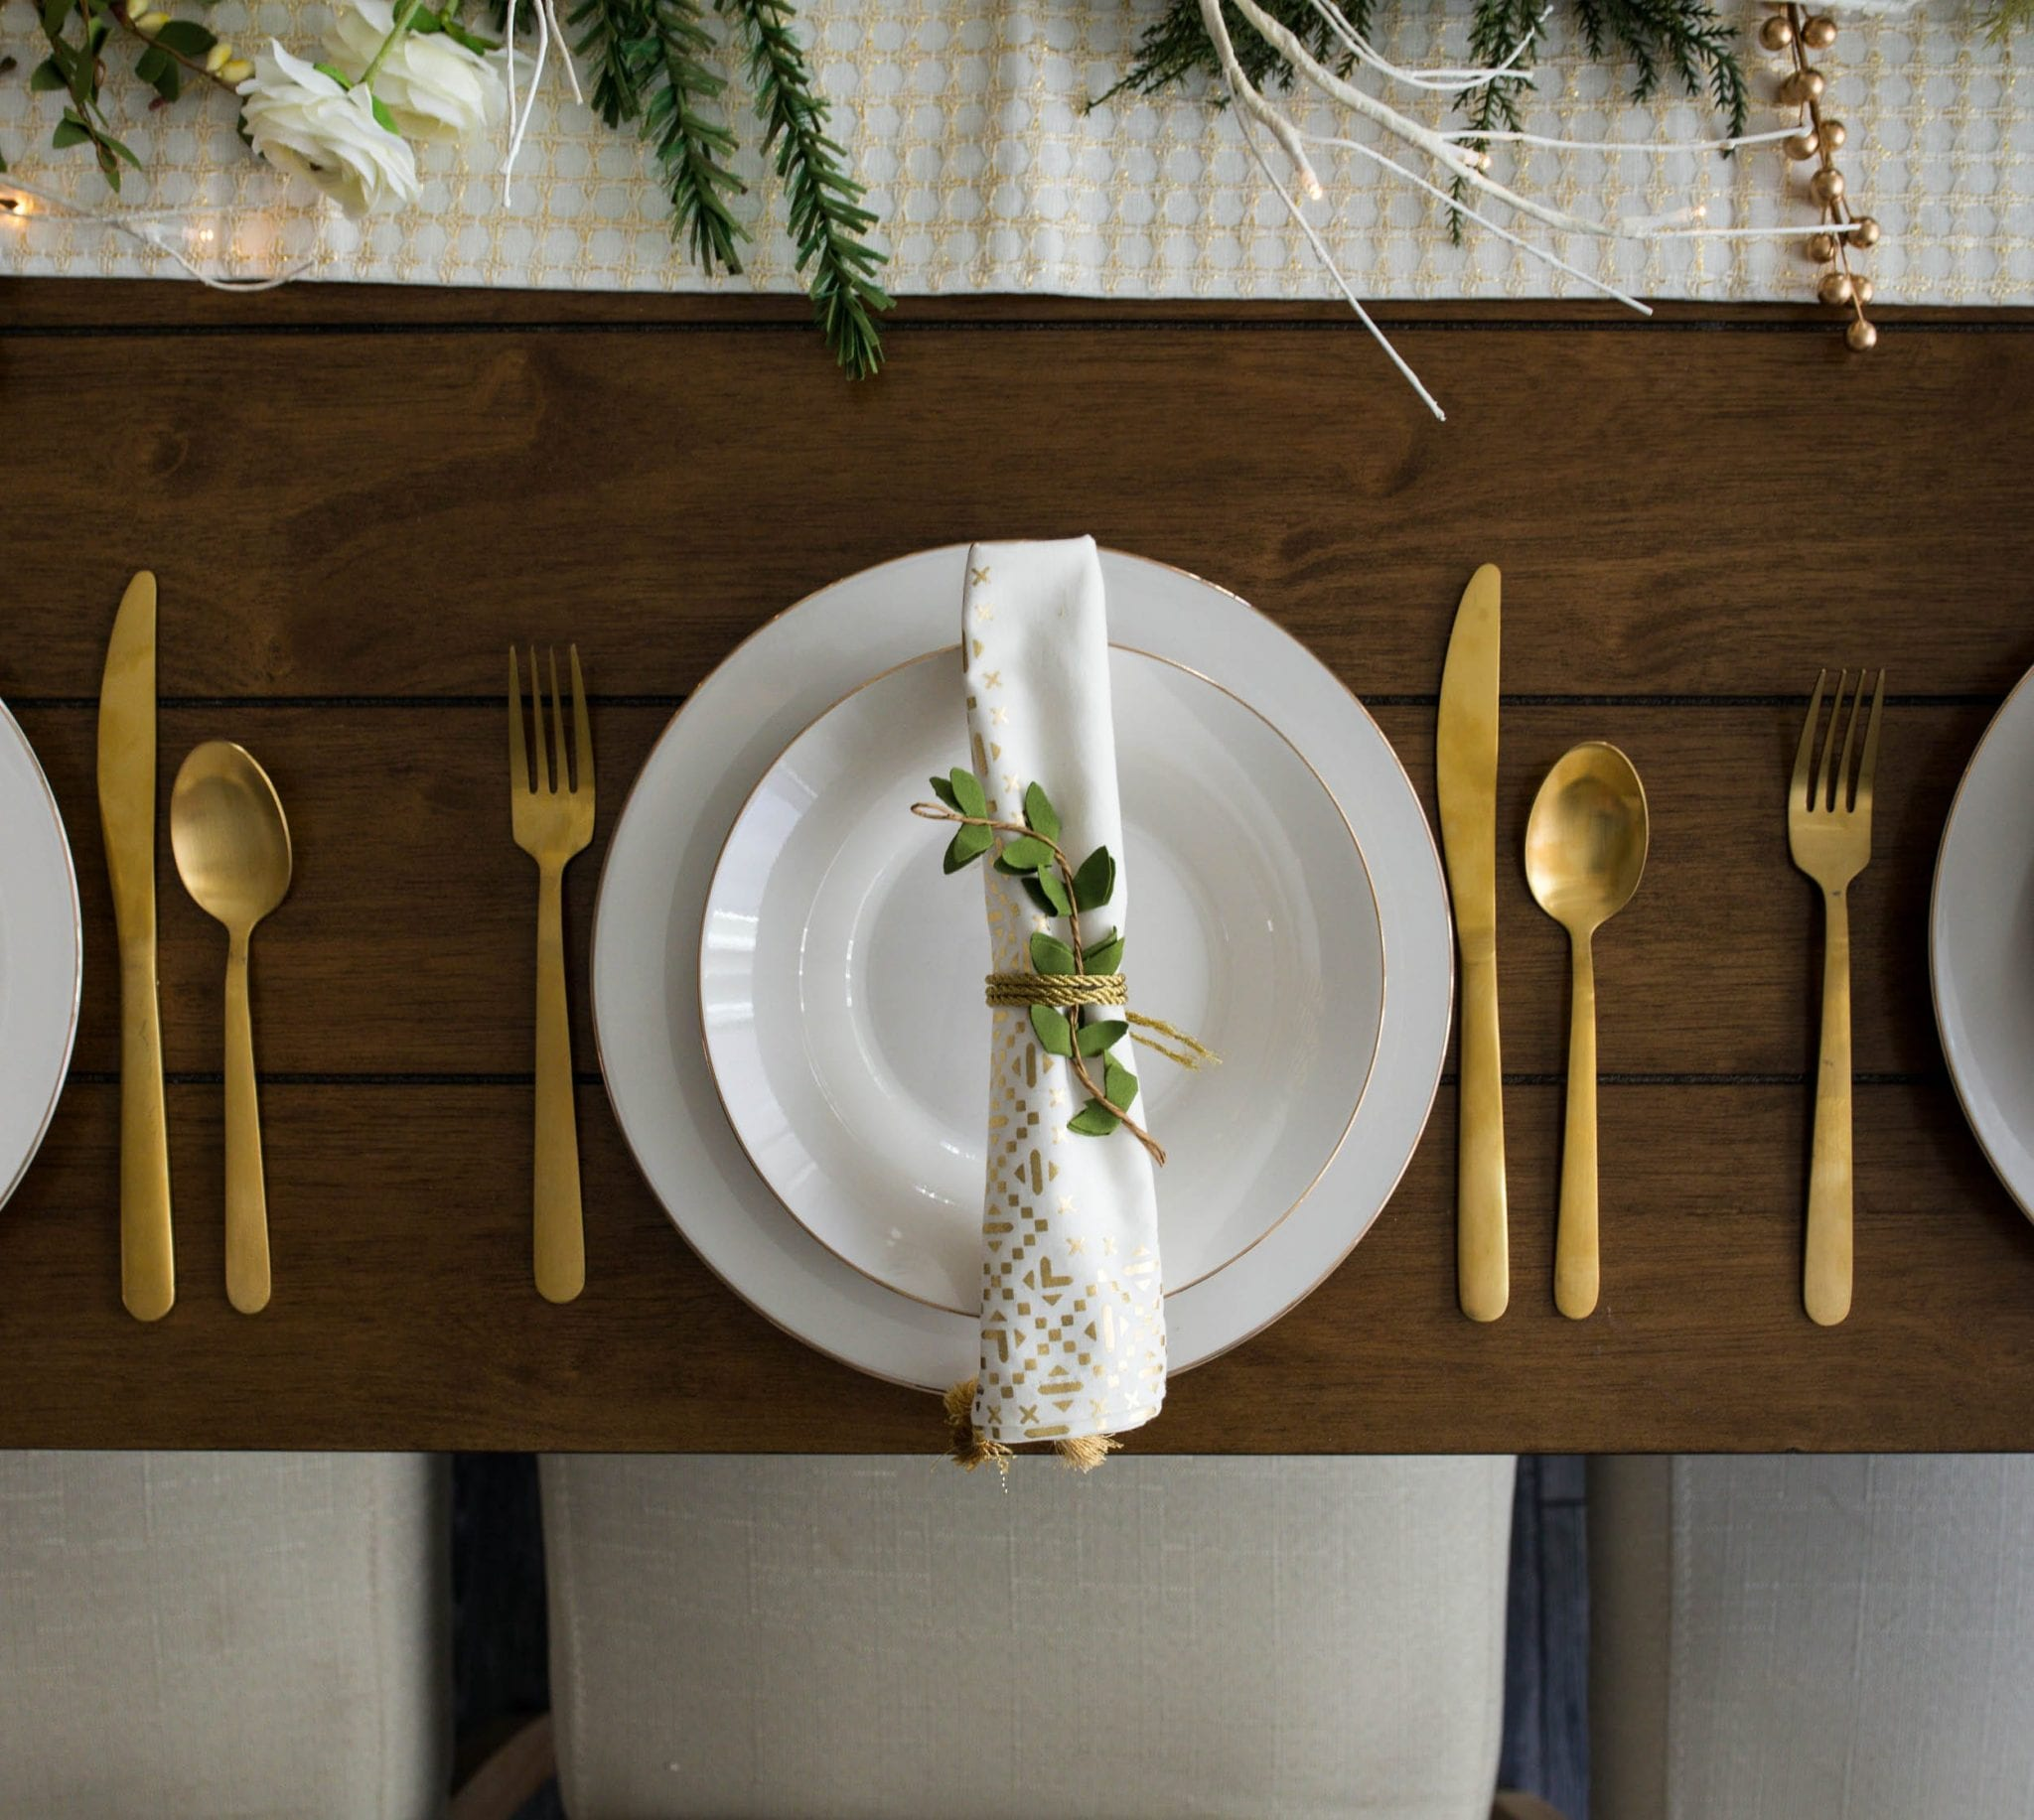 fall decor ideas | fall decor not orange | fall decor ideas for the home | fall decorations for home | never skip brunch by cara newhart #decor #fall